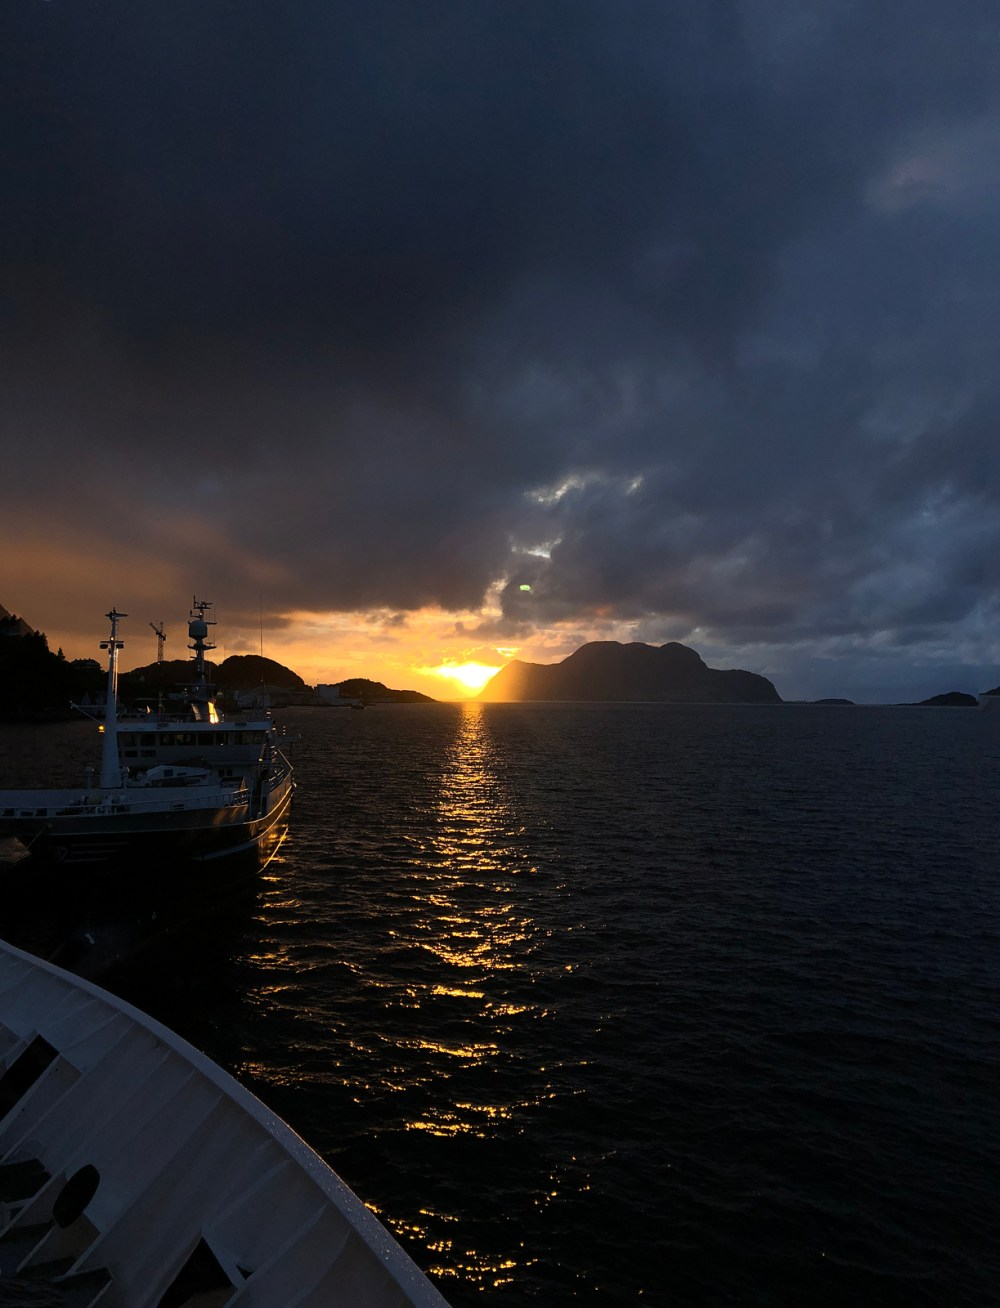 Sonnenuntergang in Ålesund an Bord der MS Polarlys